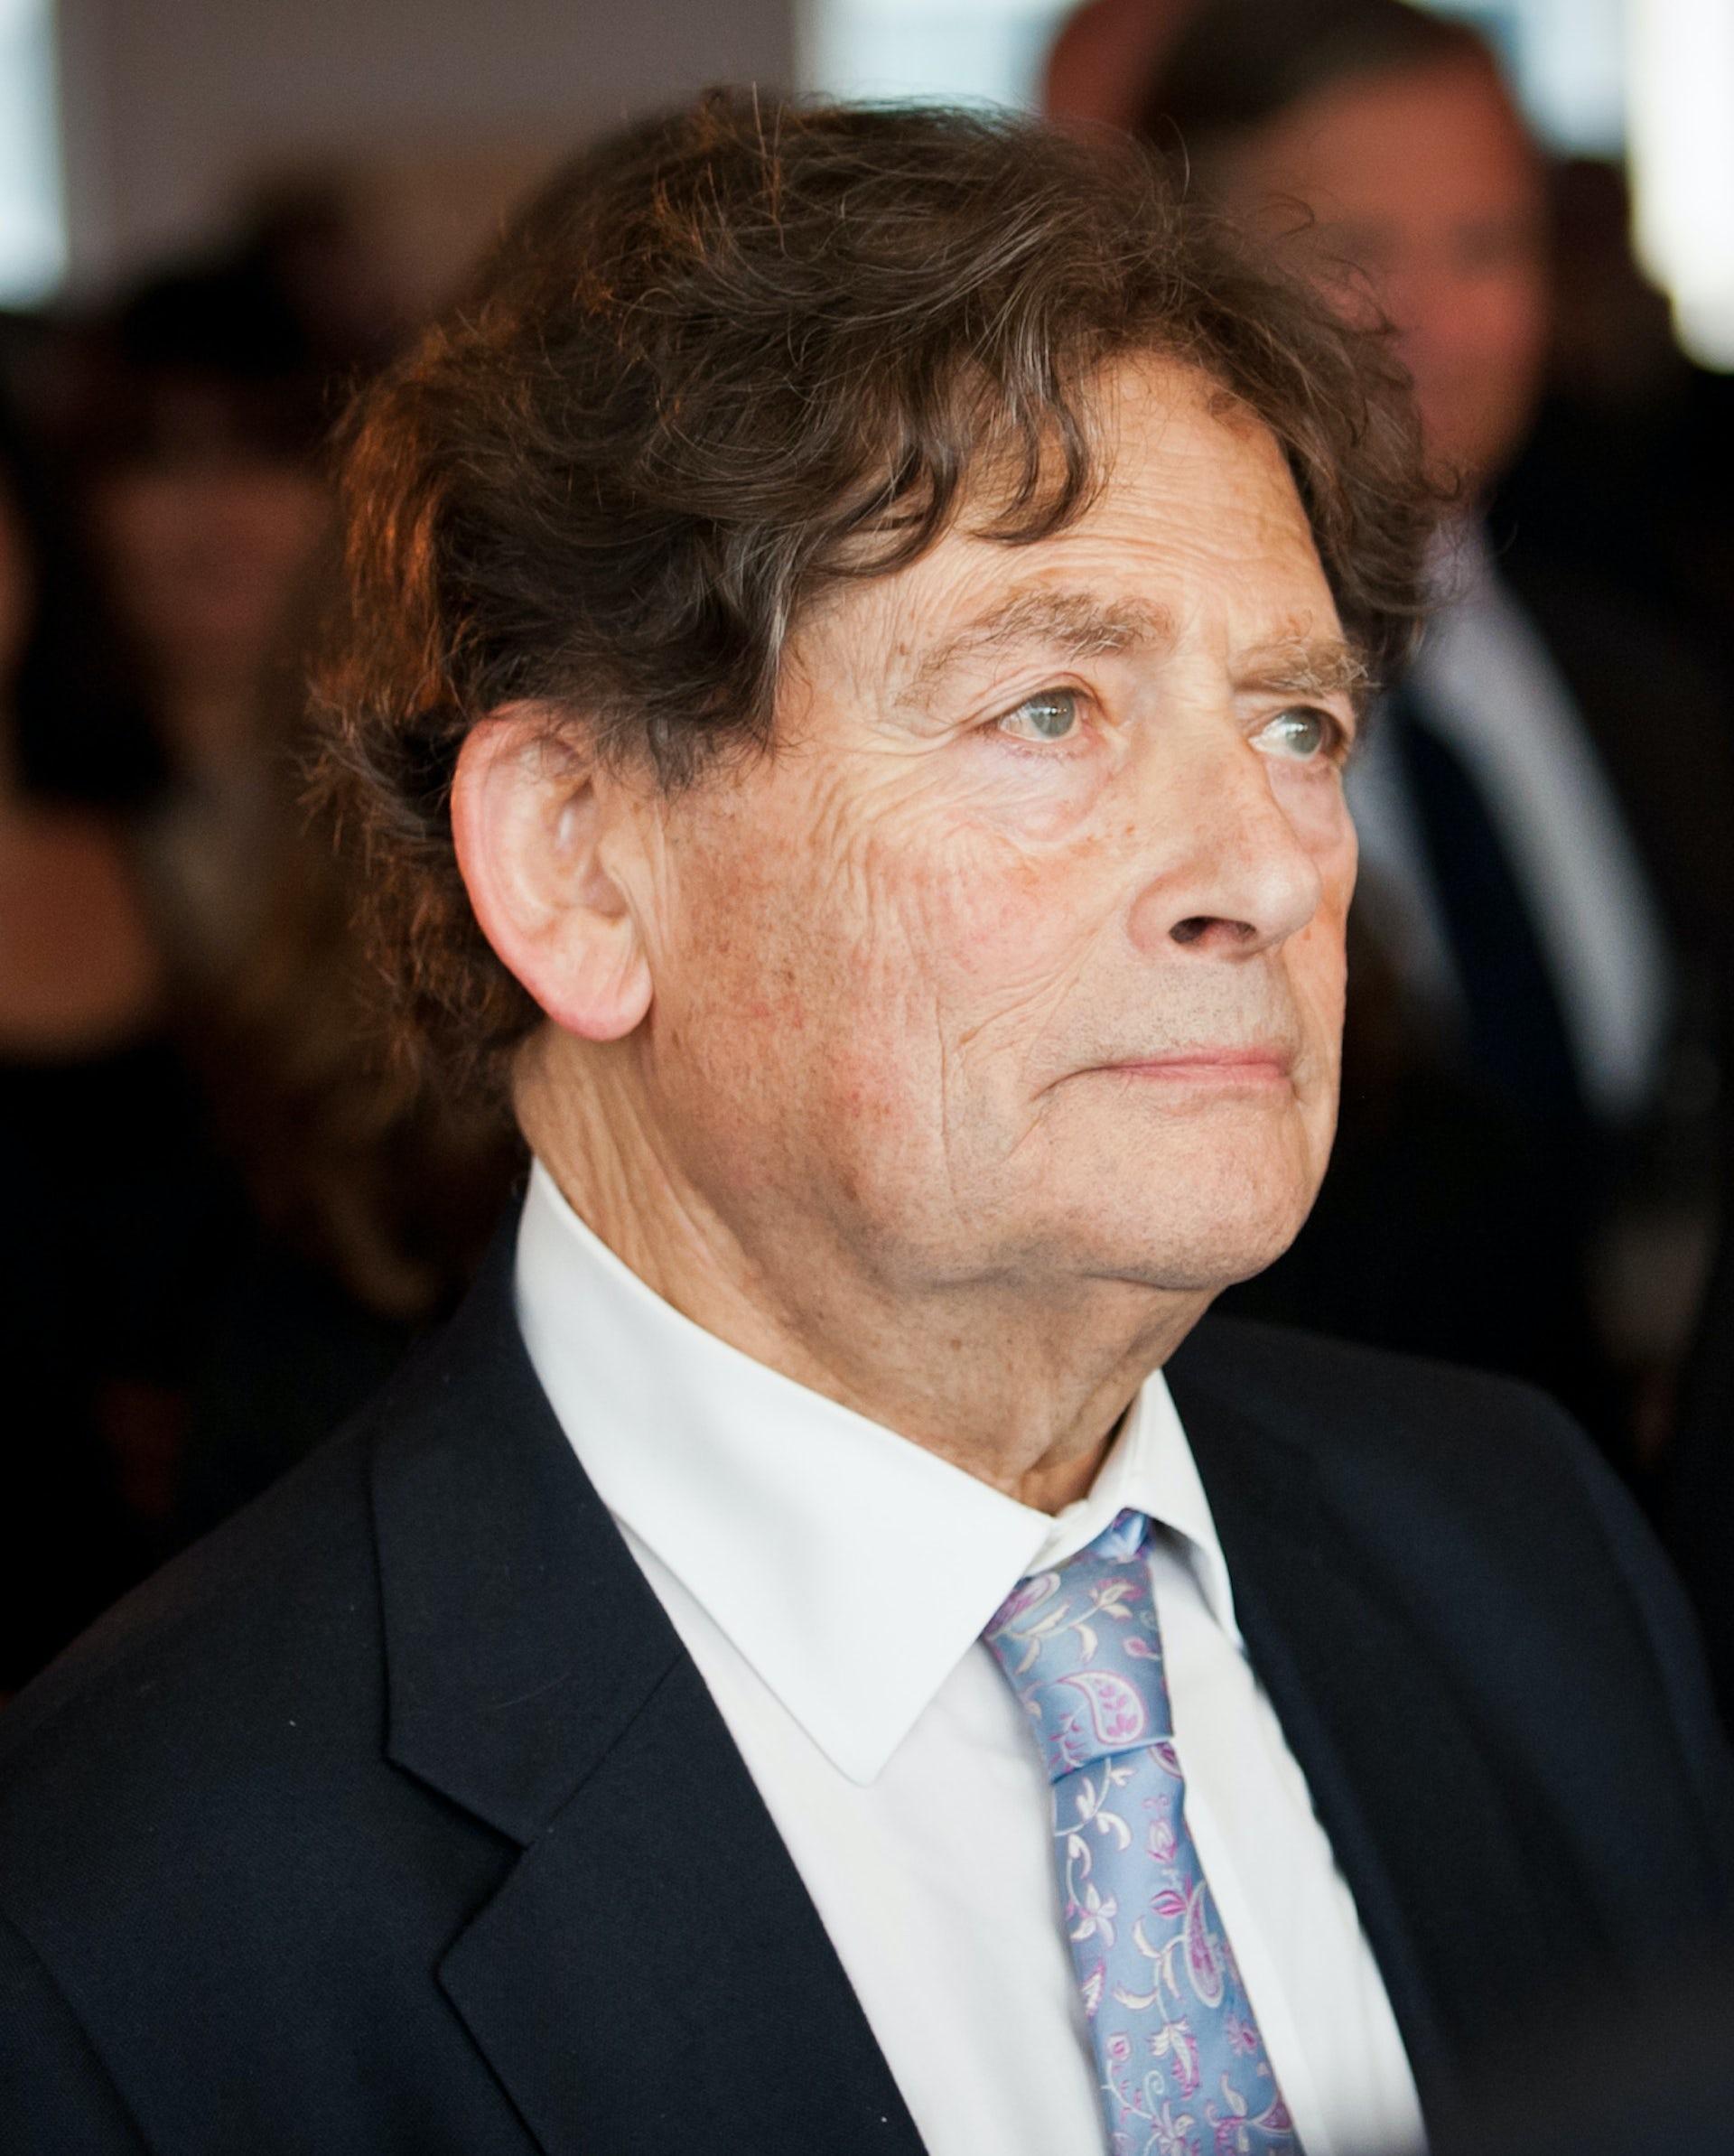 Nigel Lawson | Wikimedia